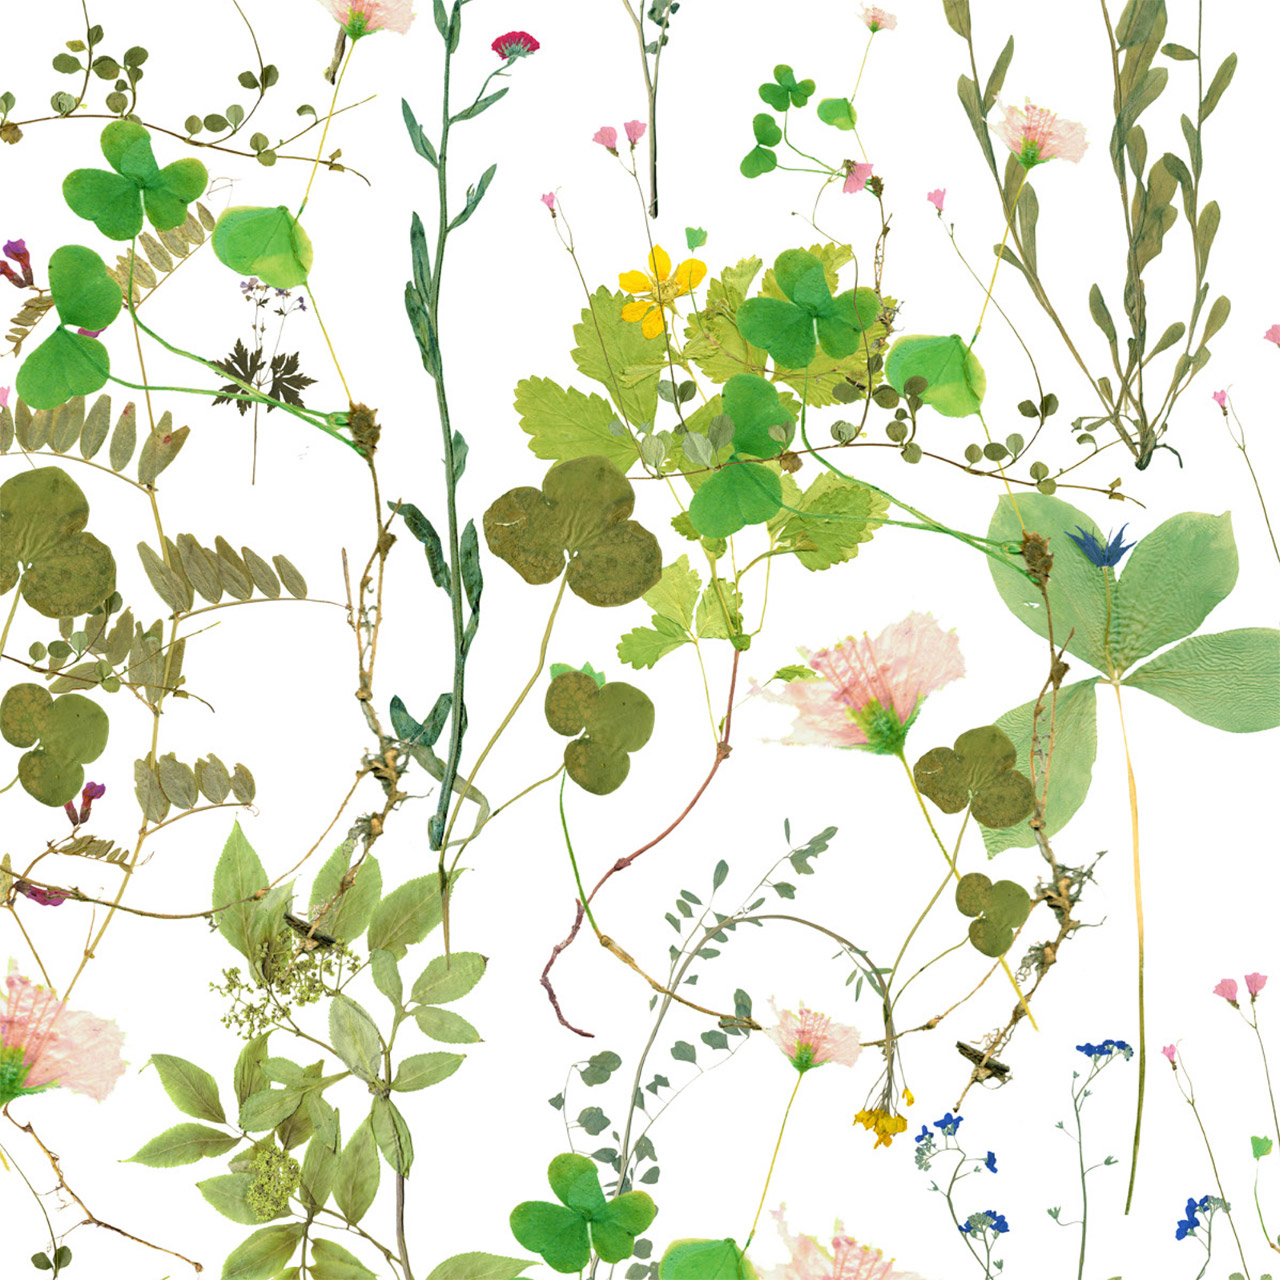 ivana-helsinki-herbarium